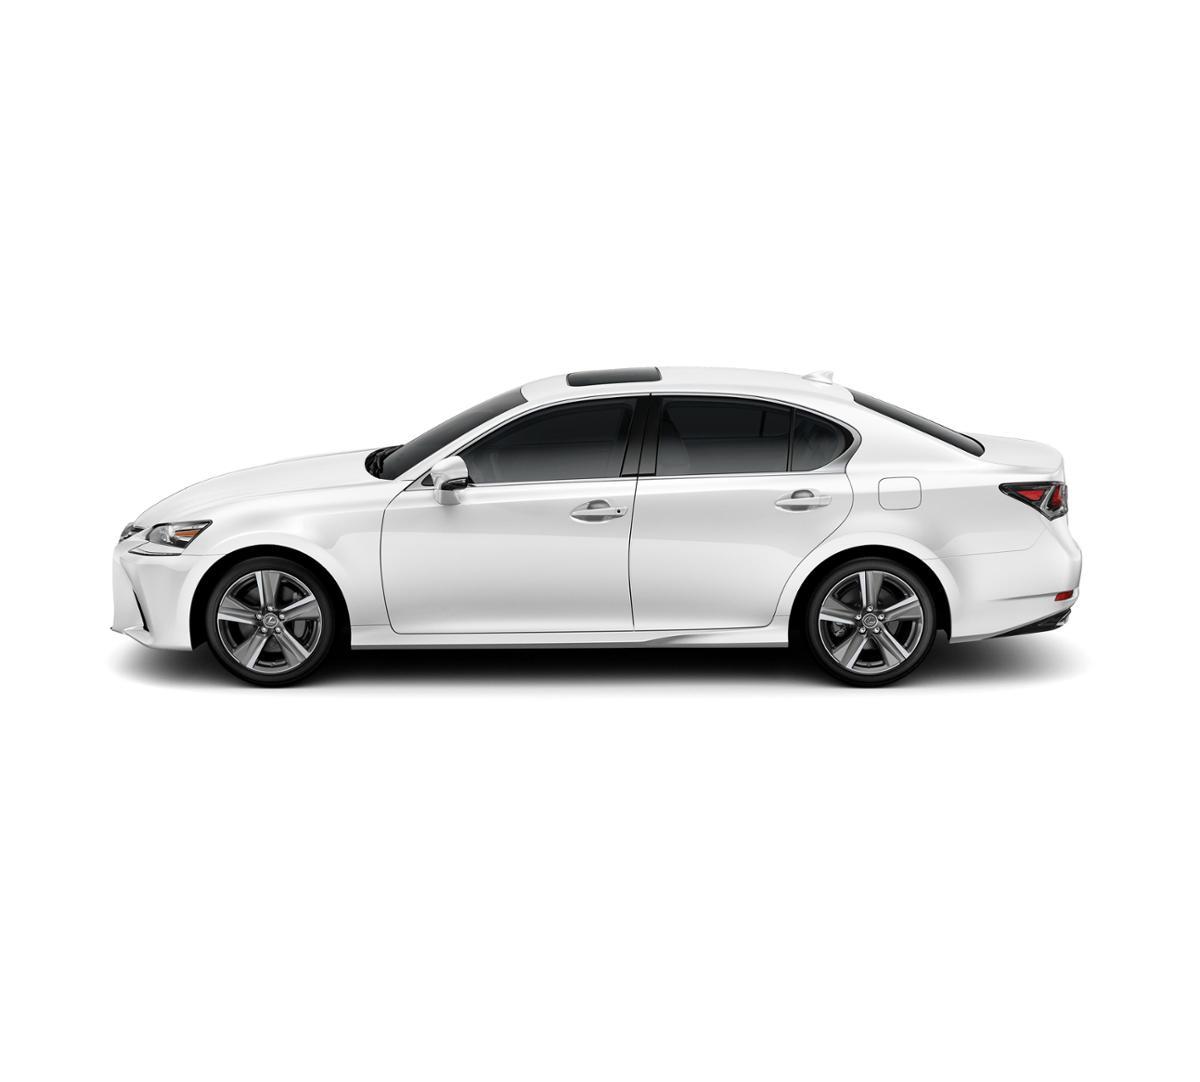 Cadillac Dealer Pembroke Pines: Henderson Eminent White Pearl 2018 Lexus GS 350: New Car